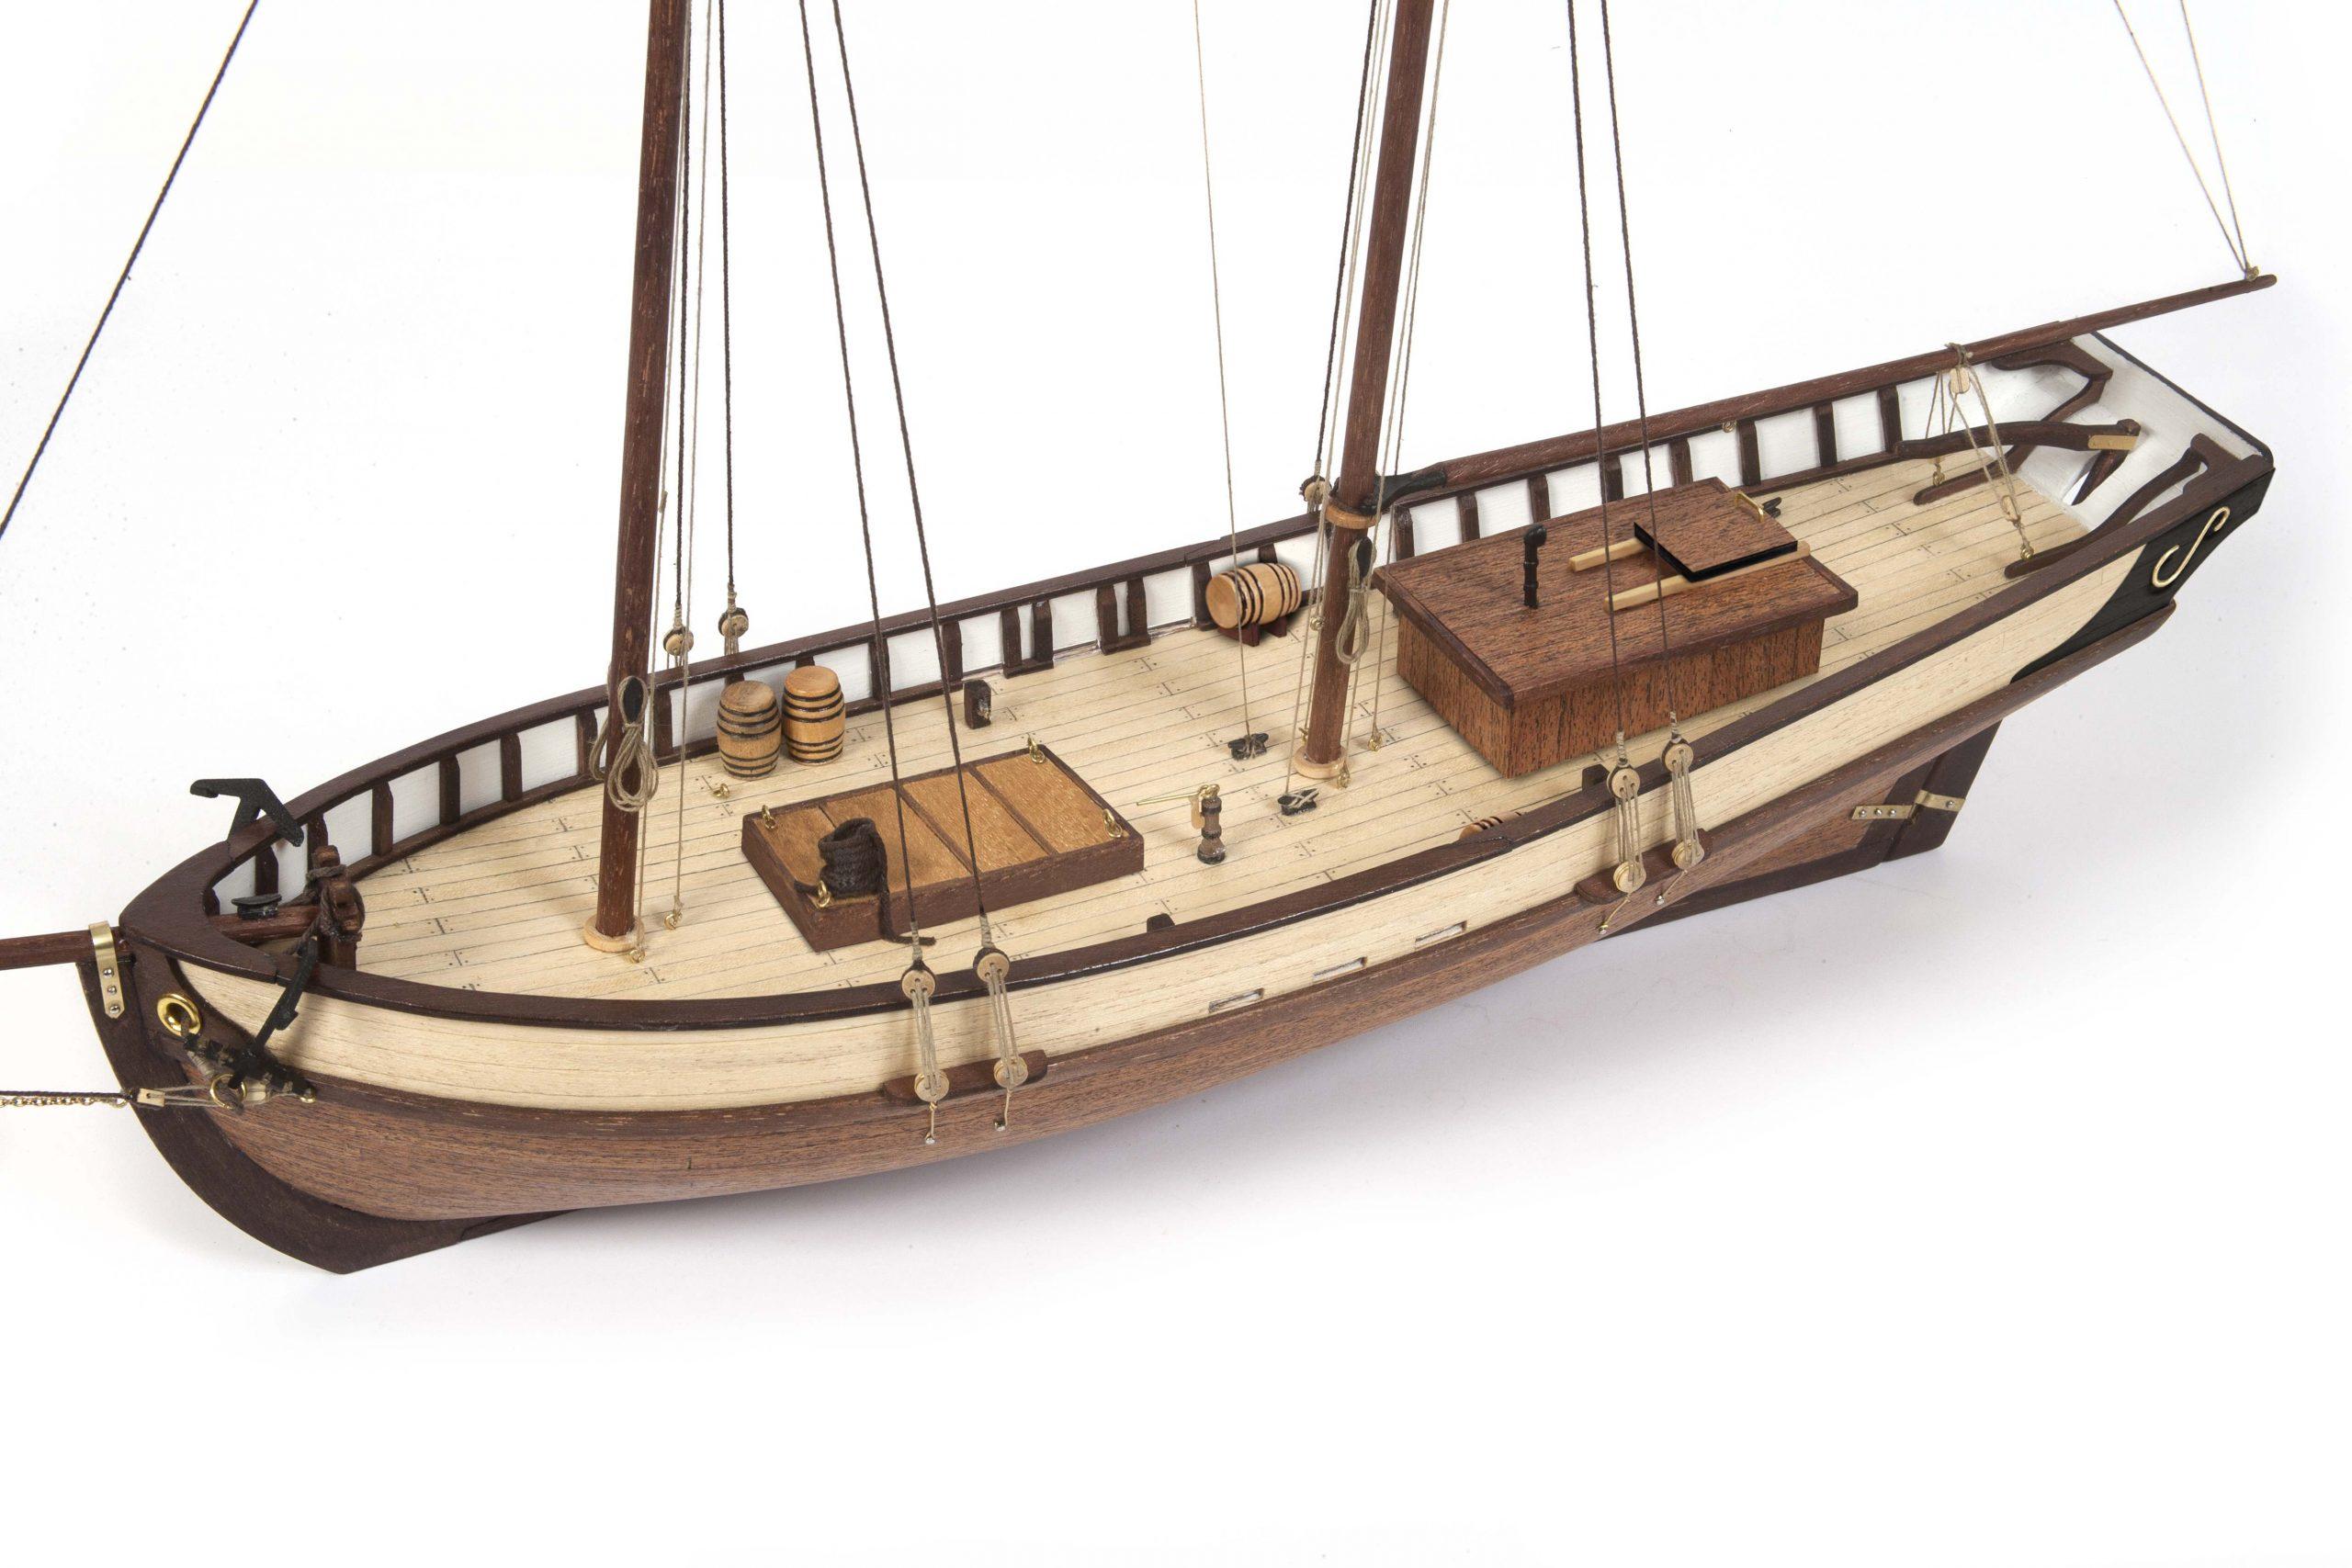 Polaris Model Boat Kit – Occre (12007B)